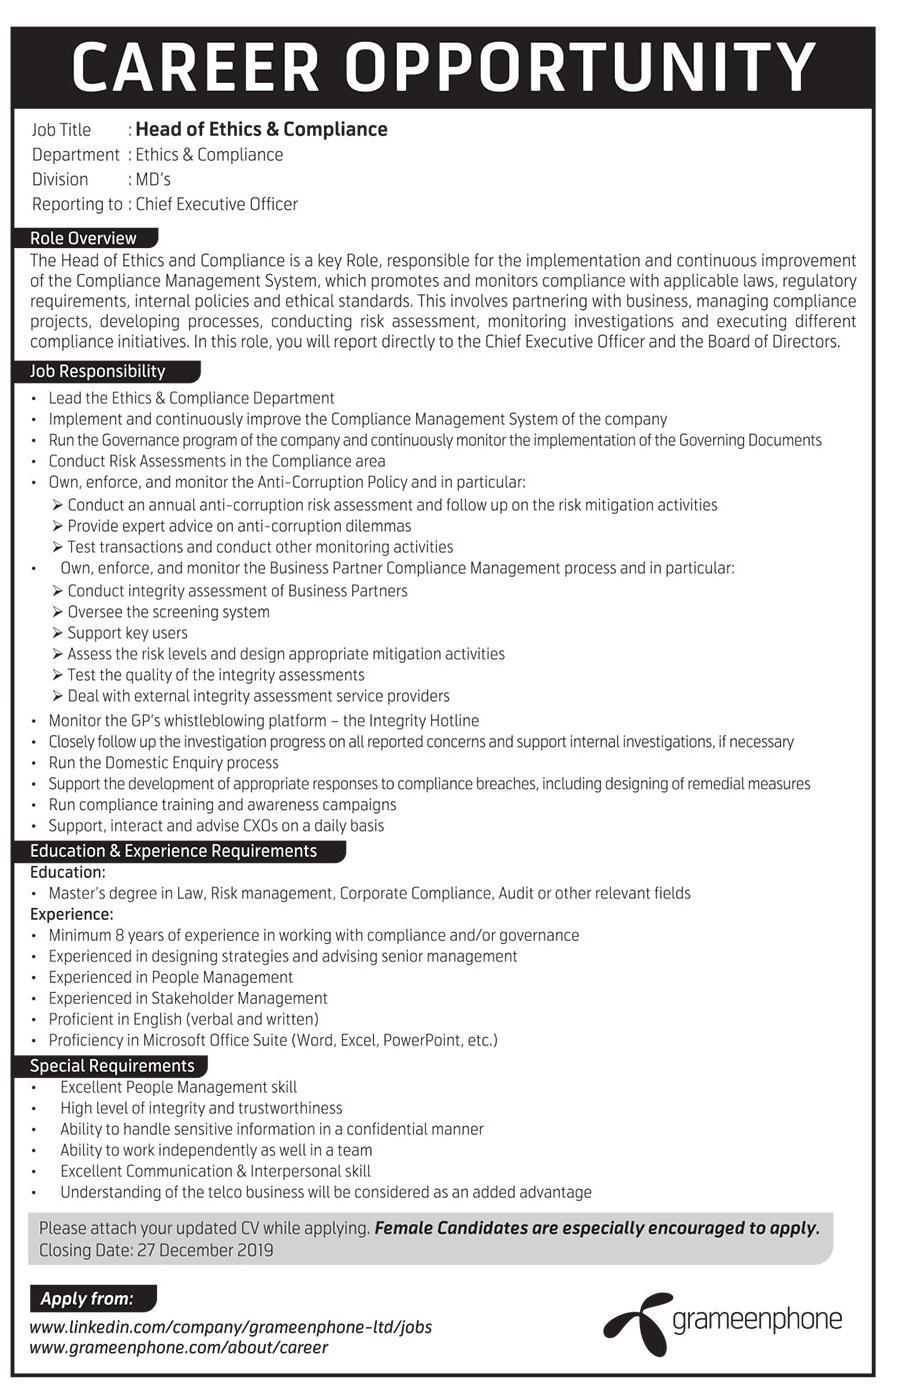 Grameenphone Job Circular 2019